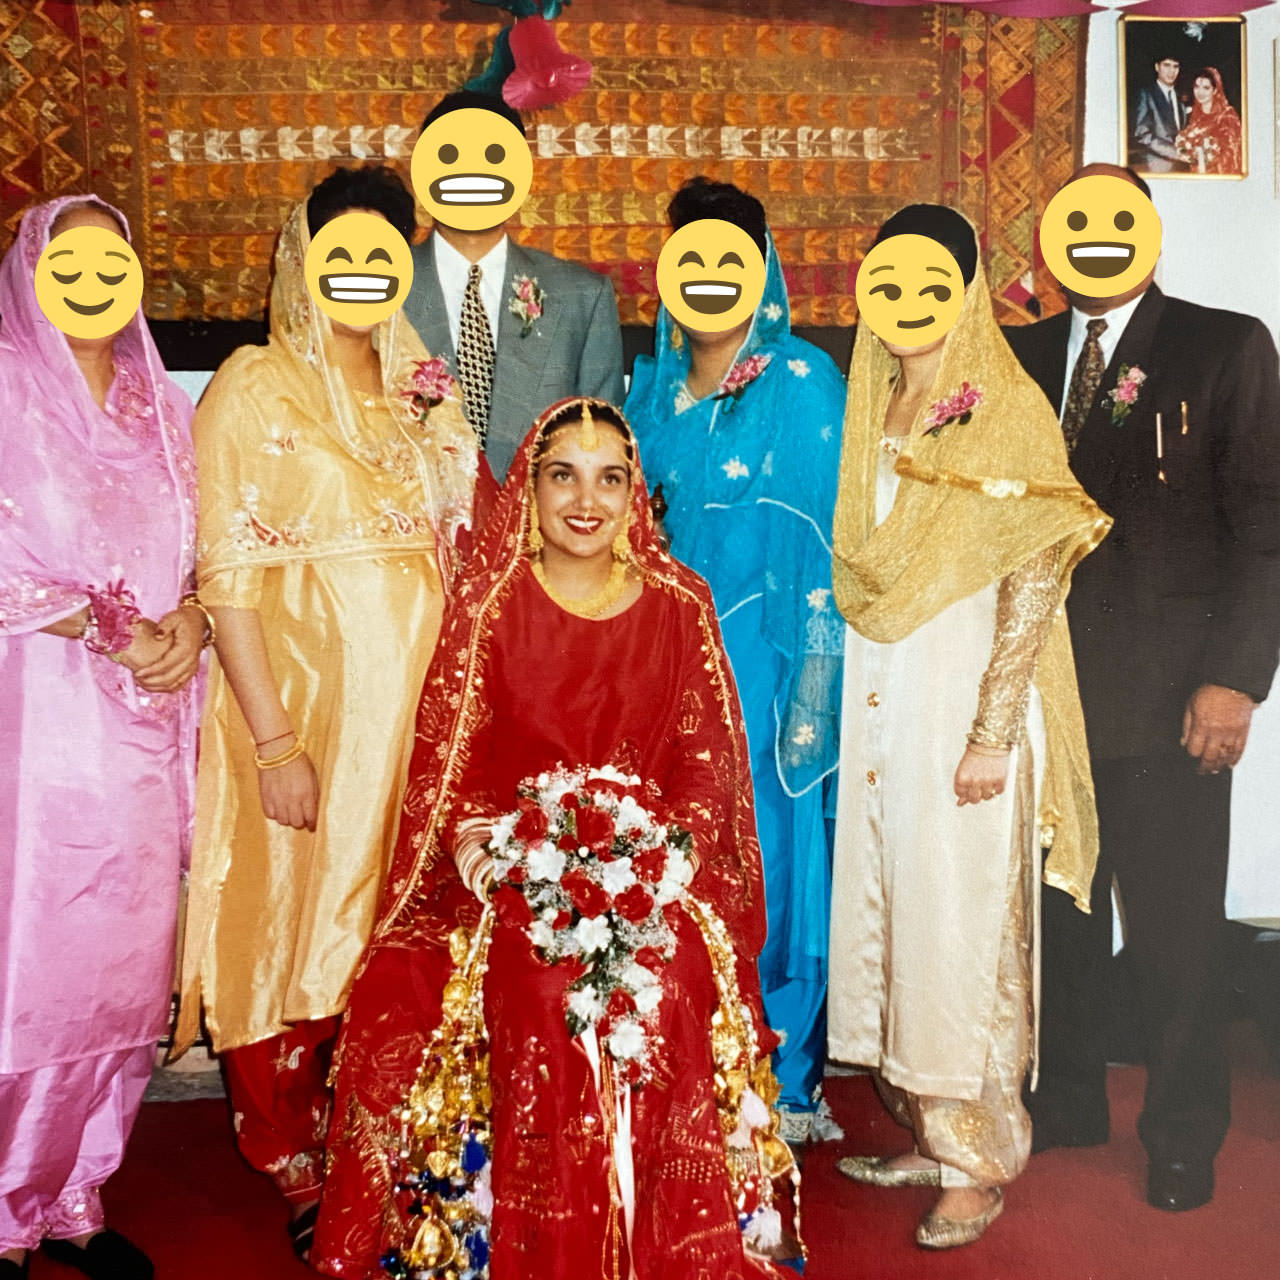 sonia-last-wedding-emoji